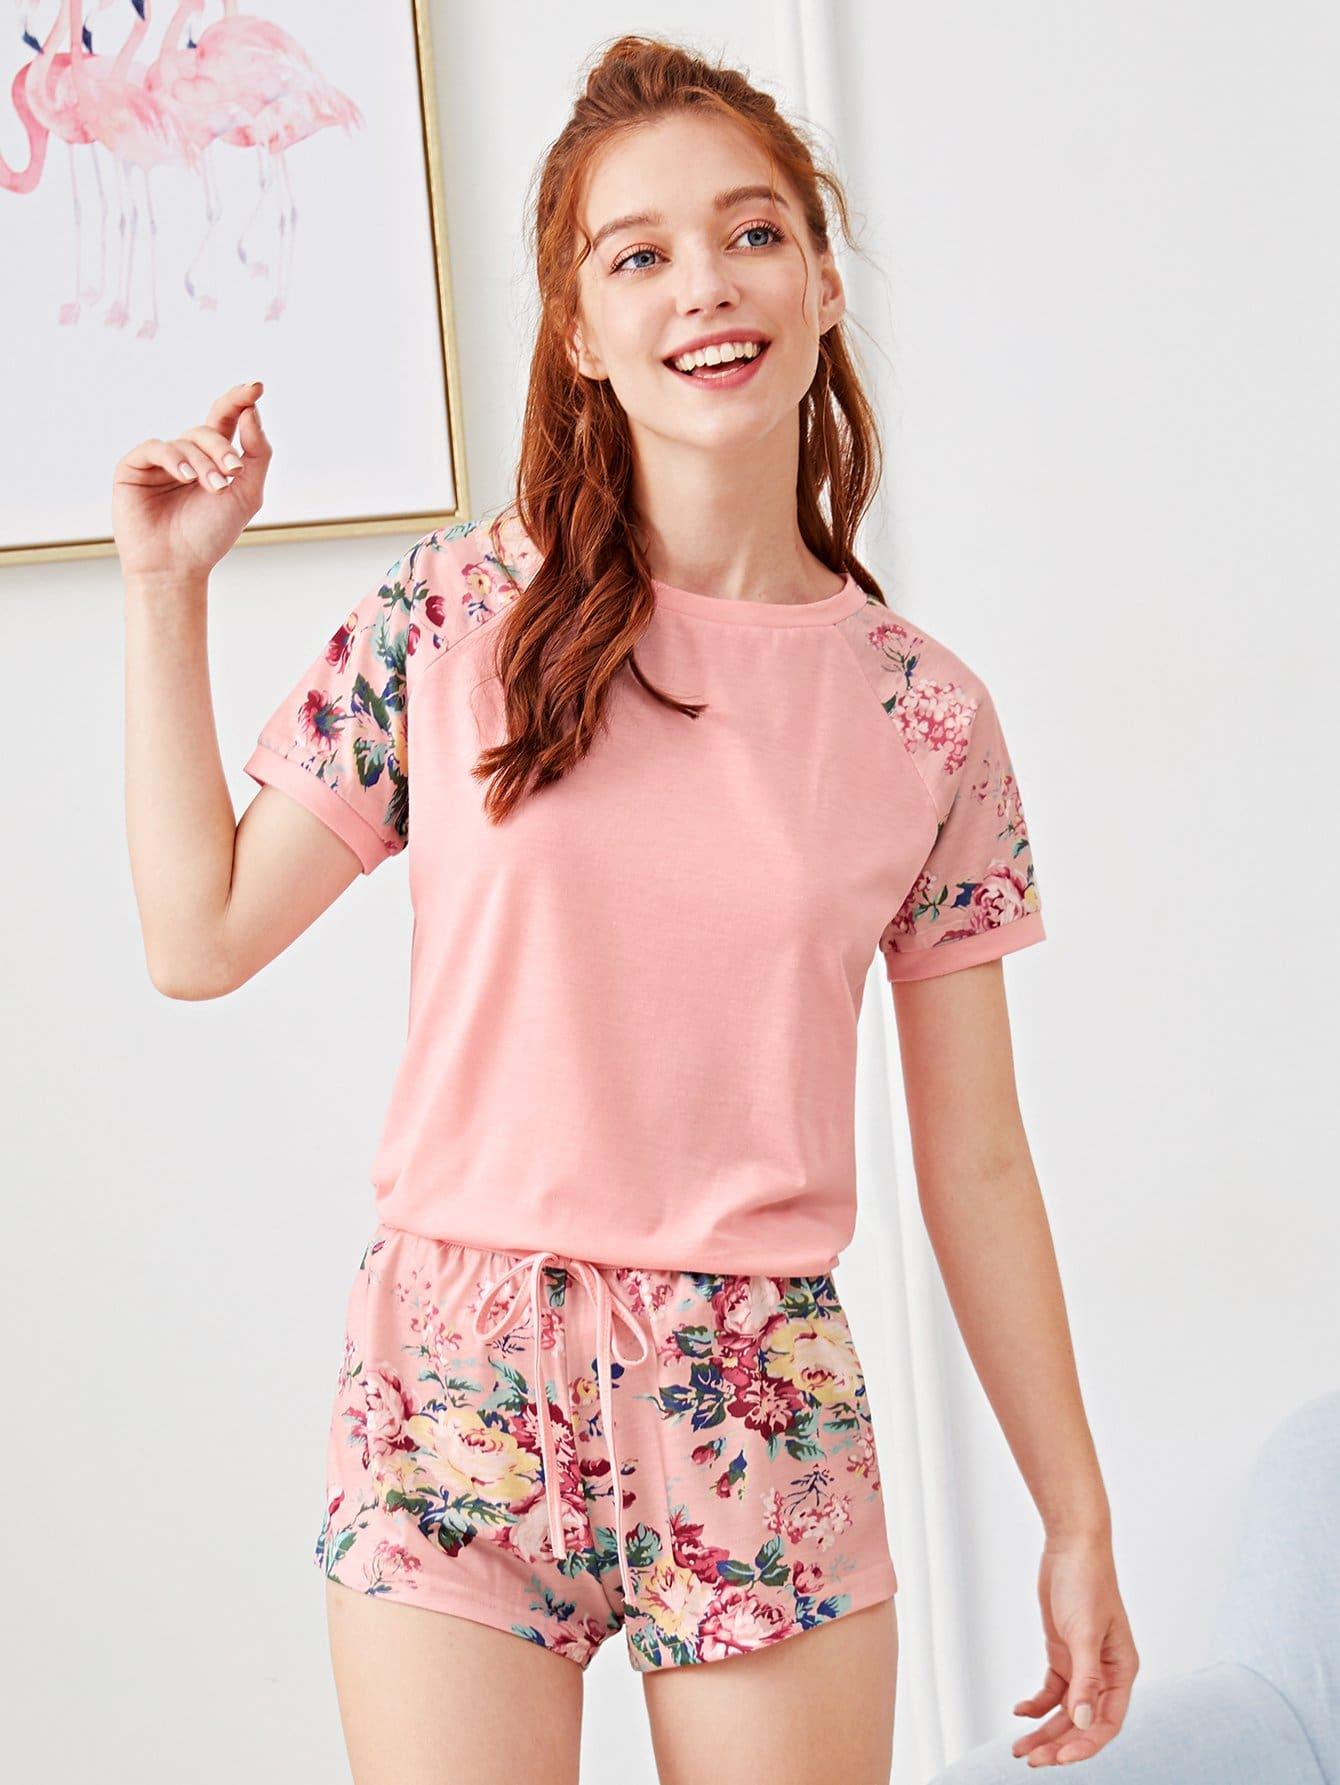 Raglan Sleeve Curved Hem Top & Floral Shorts PJ Set flamingo embroidered striped top and curved hem shorts set